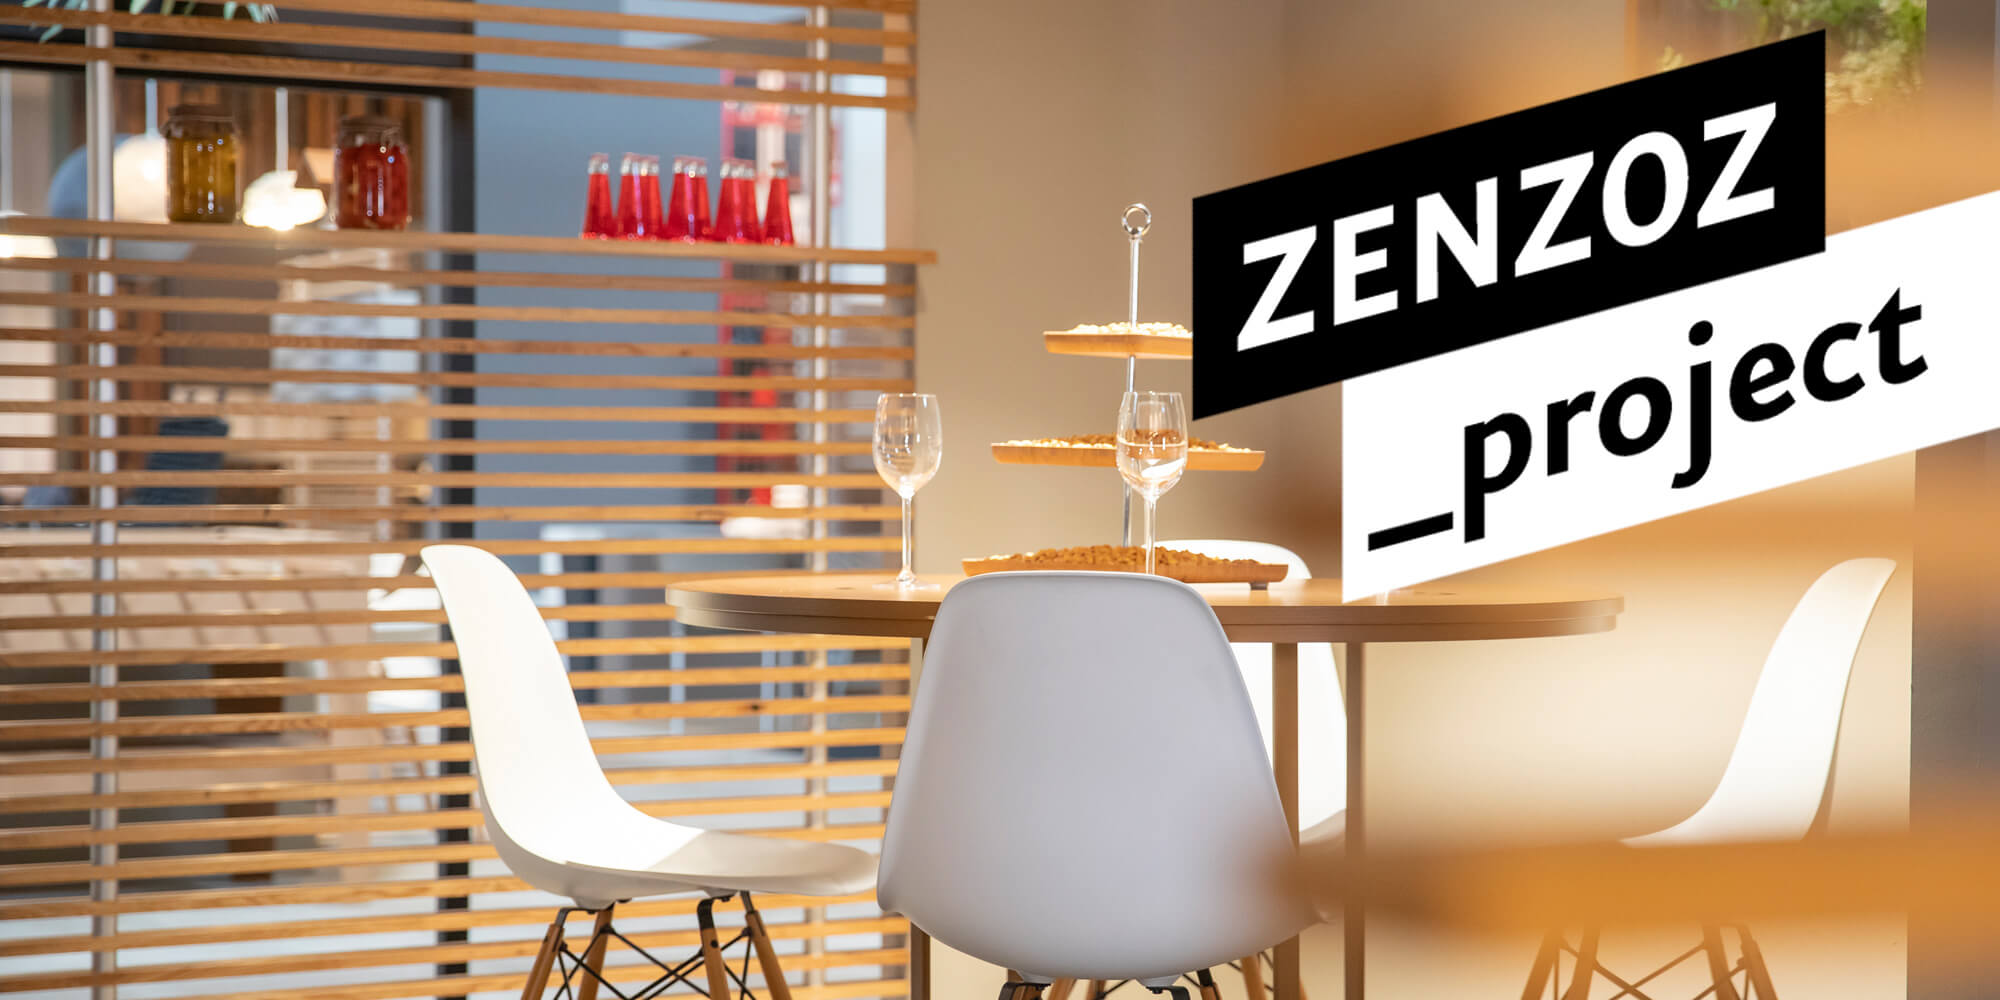 ZENZOZ_Themen_Teaser_project_1